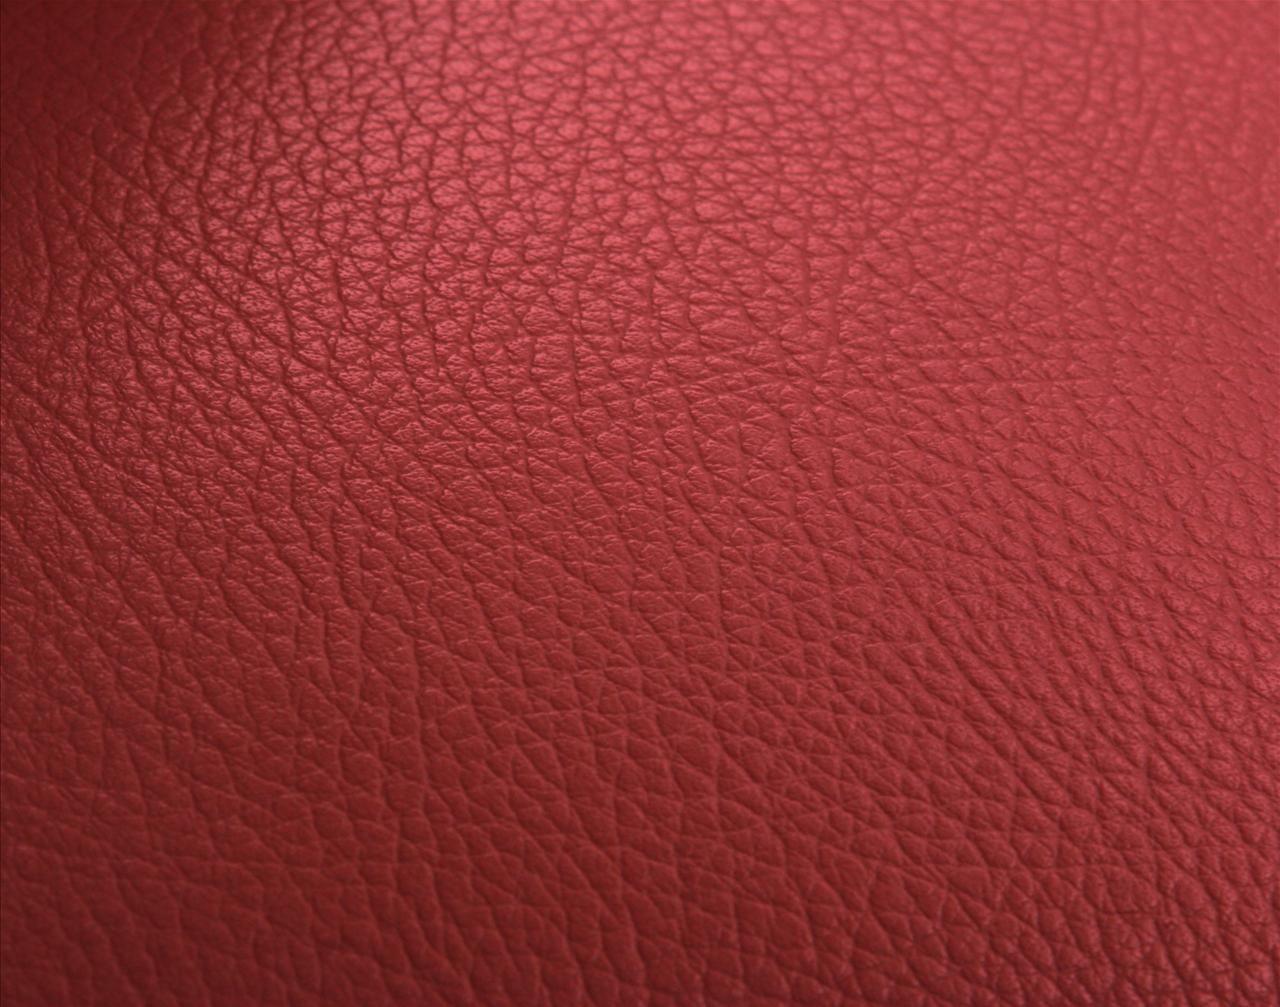 sofa design leather texture - photo #34